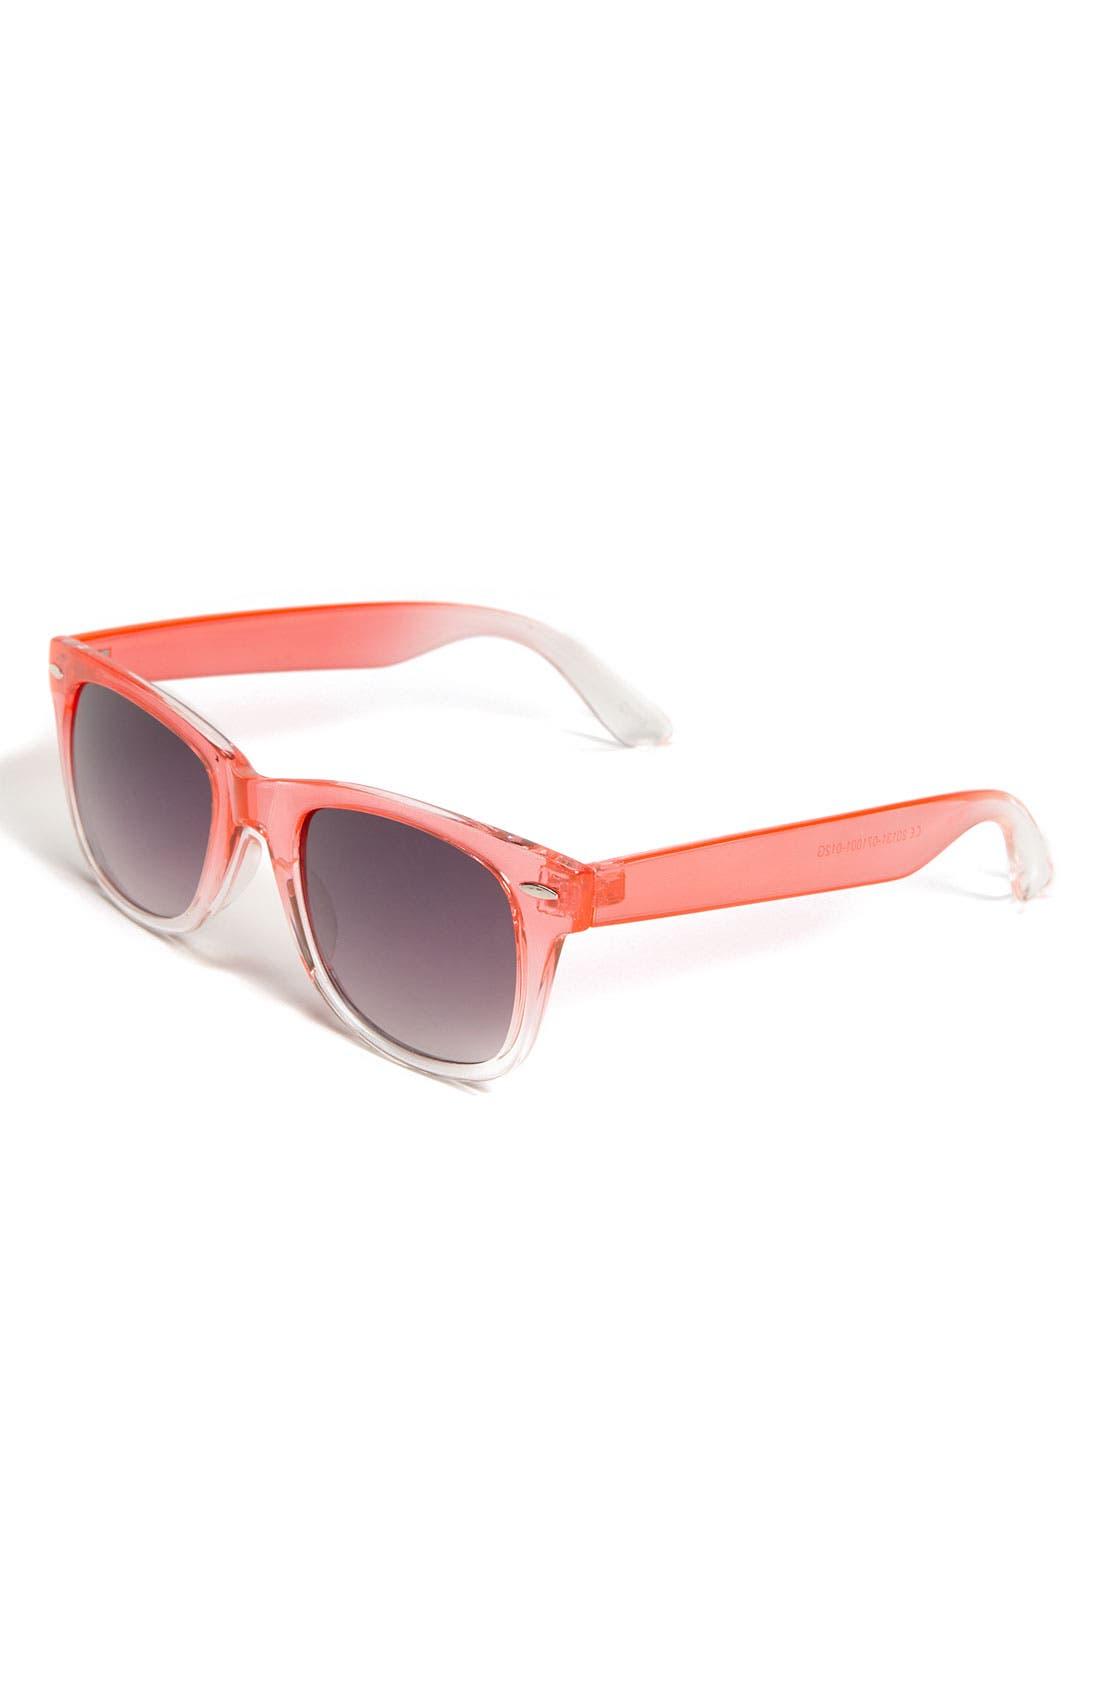 Main Image - Icon Eyewear Ombré Sunglasses (Girls)